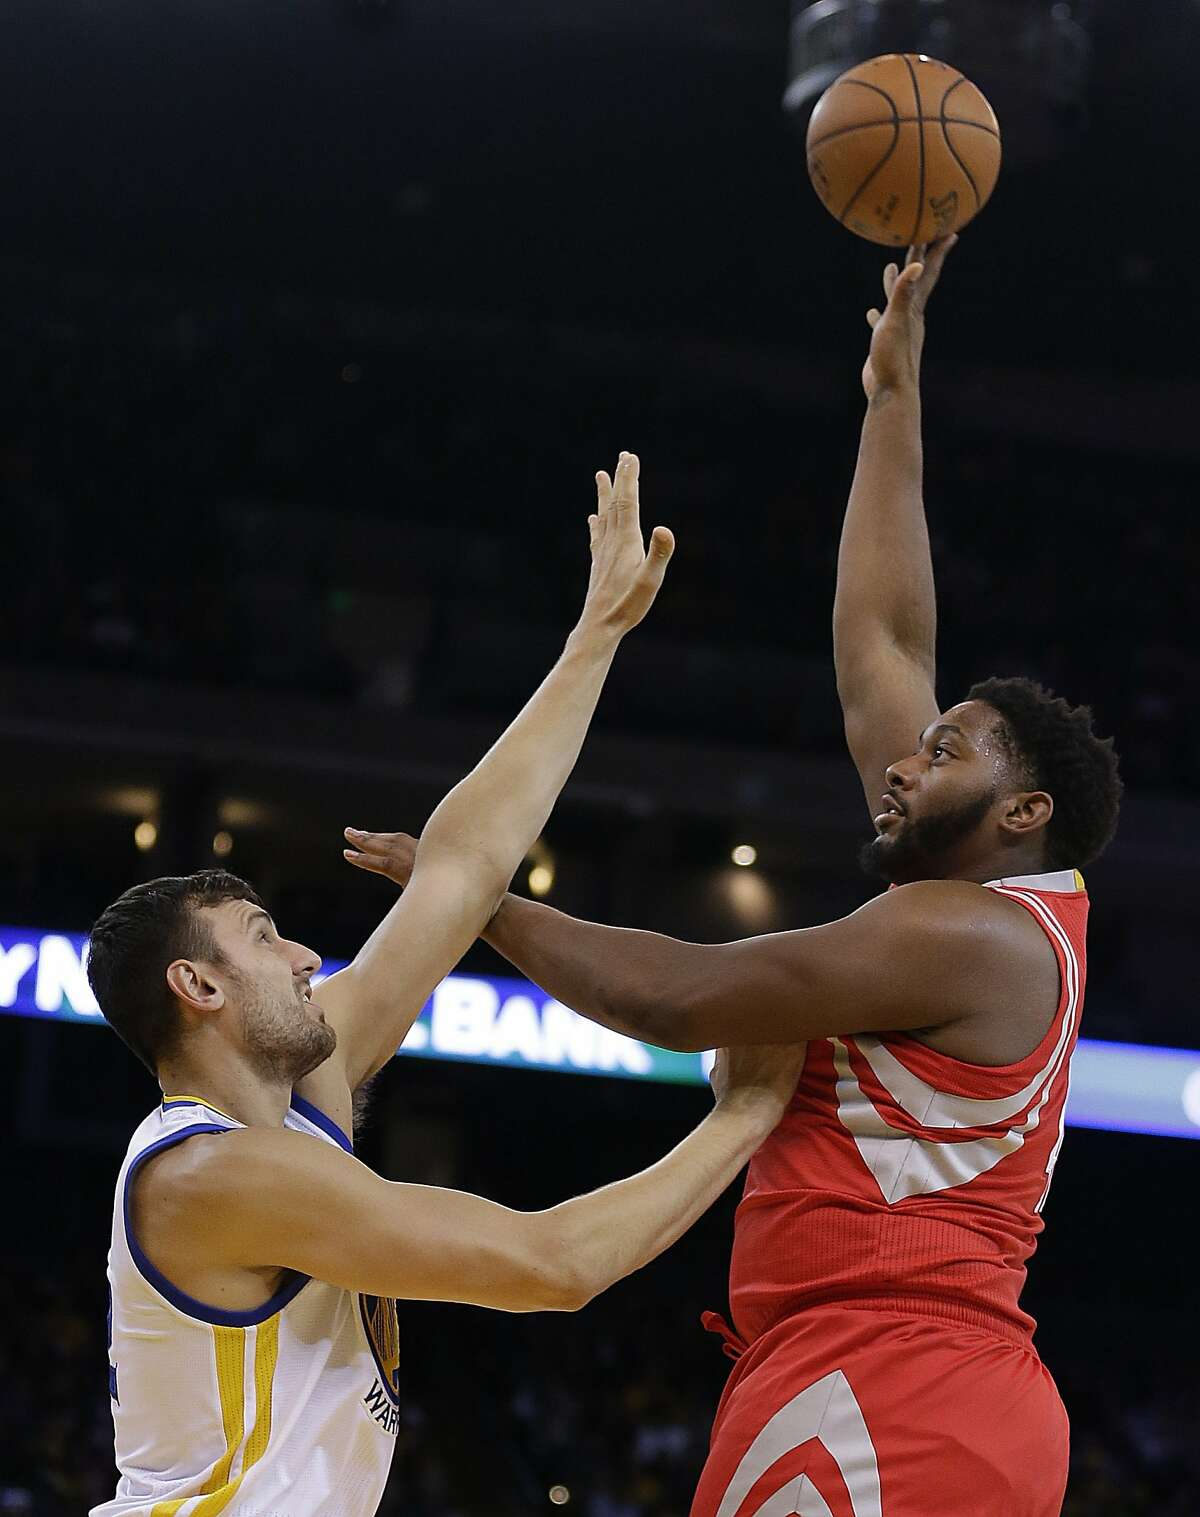 Houston Rockets' Joshua Smith, right, shoots over Golden State Warriors' Andrew Bogut during the first half of an NBA preseason basketball game Thursday, Oct. 15, 2015, in Oakland, Calif. (AP Photo/Ben Margot)